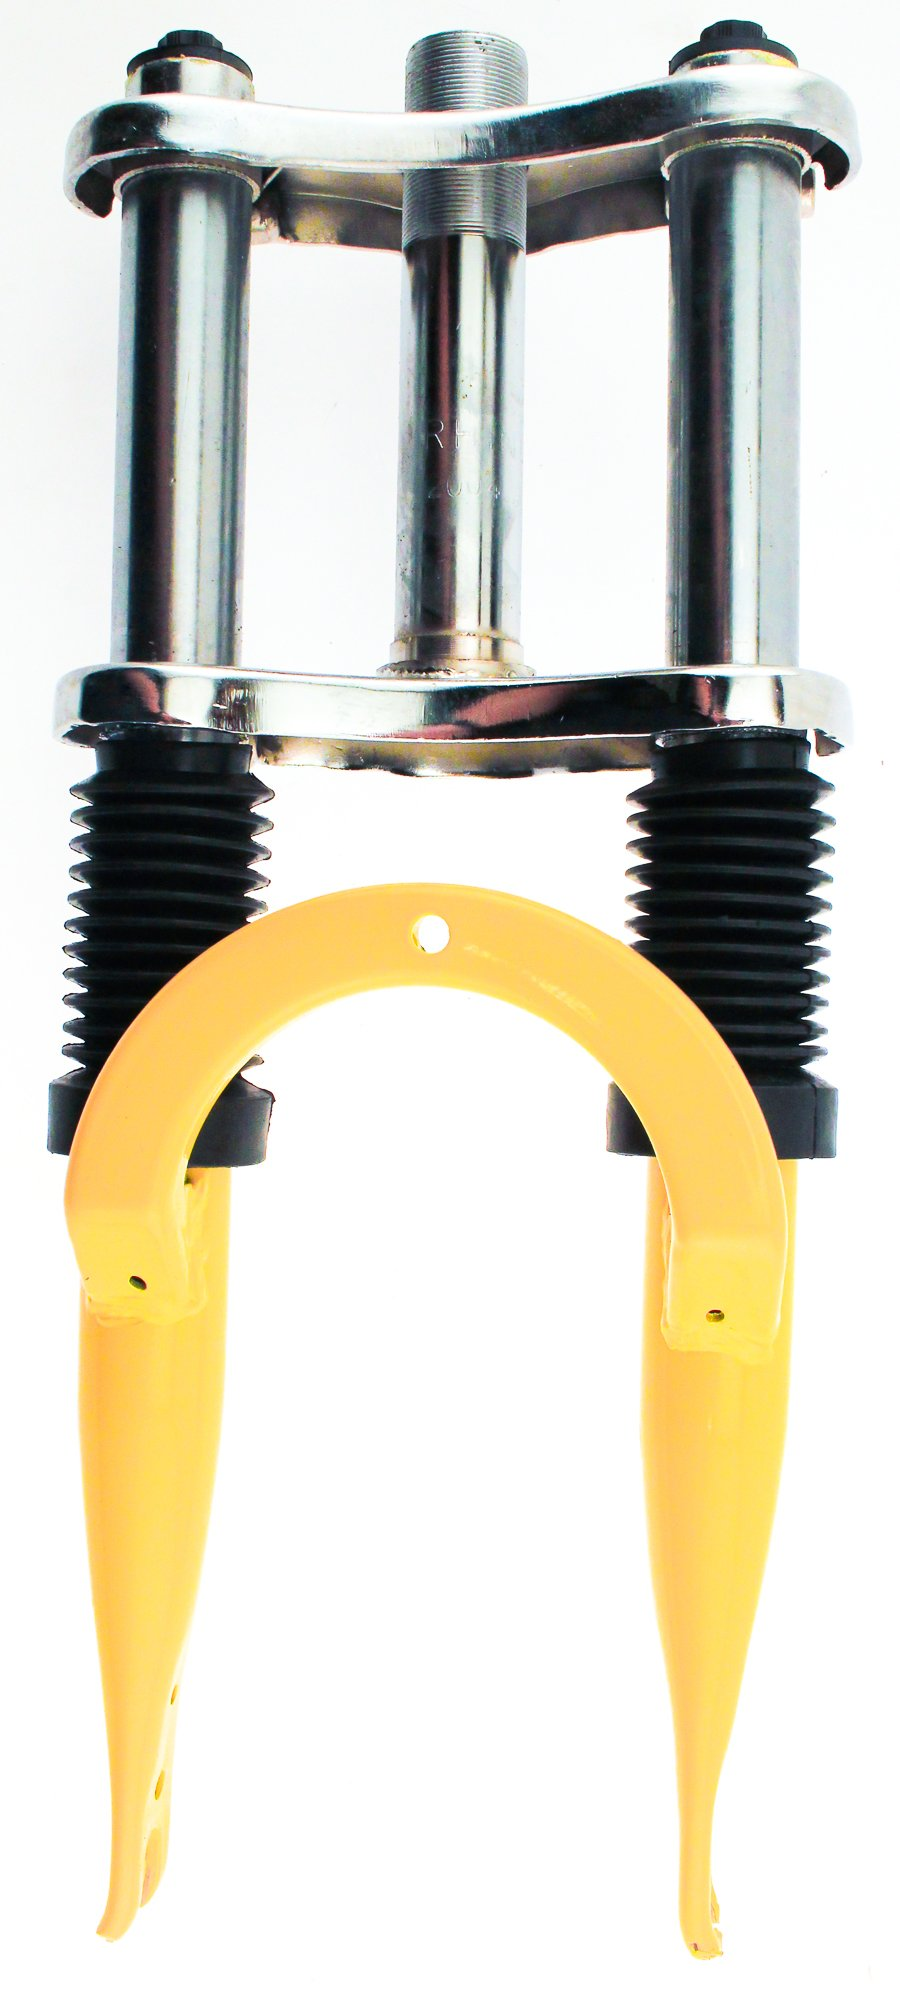 RHINO 12'' Threaded Steel 1'' Kid's Child's Yellow Bike Suspension Fork by Rhino (Image #1)